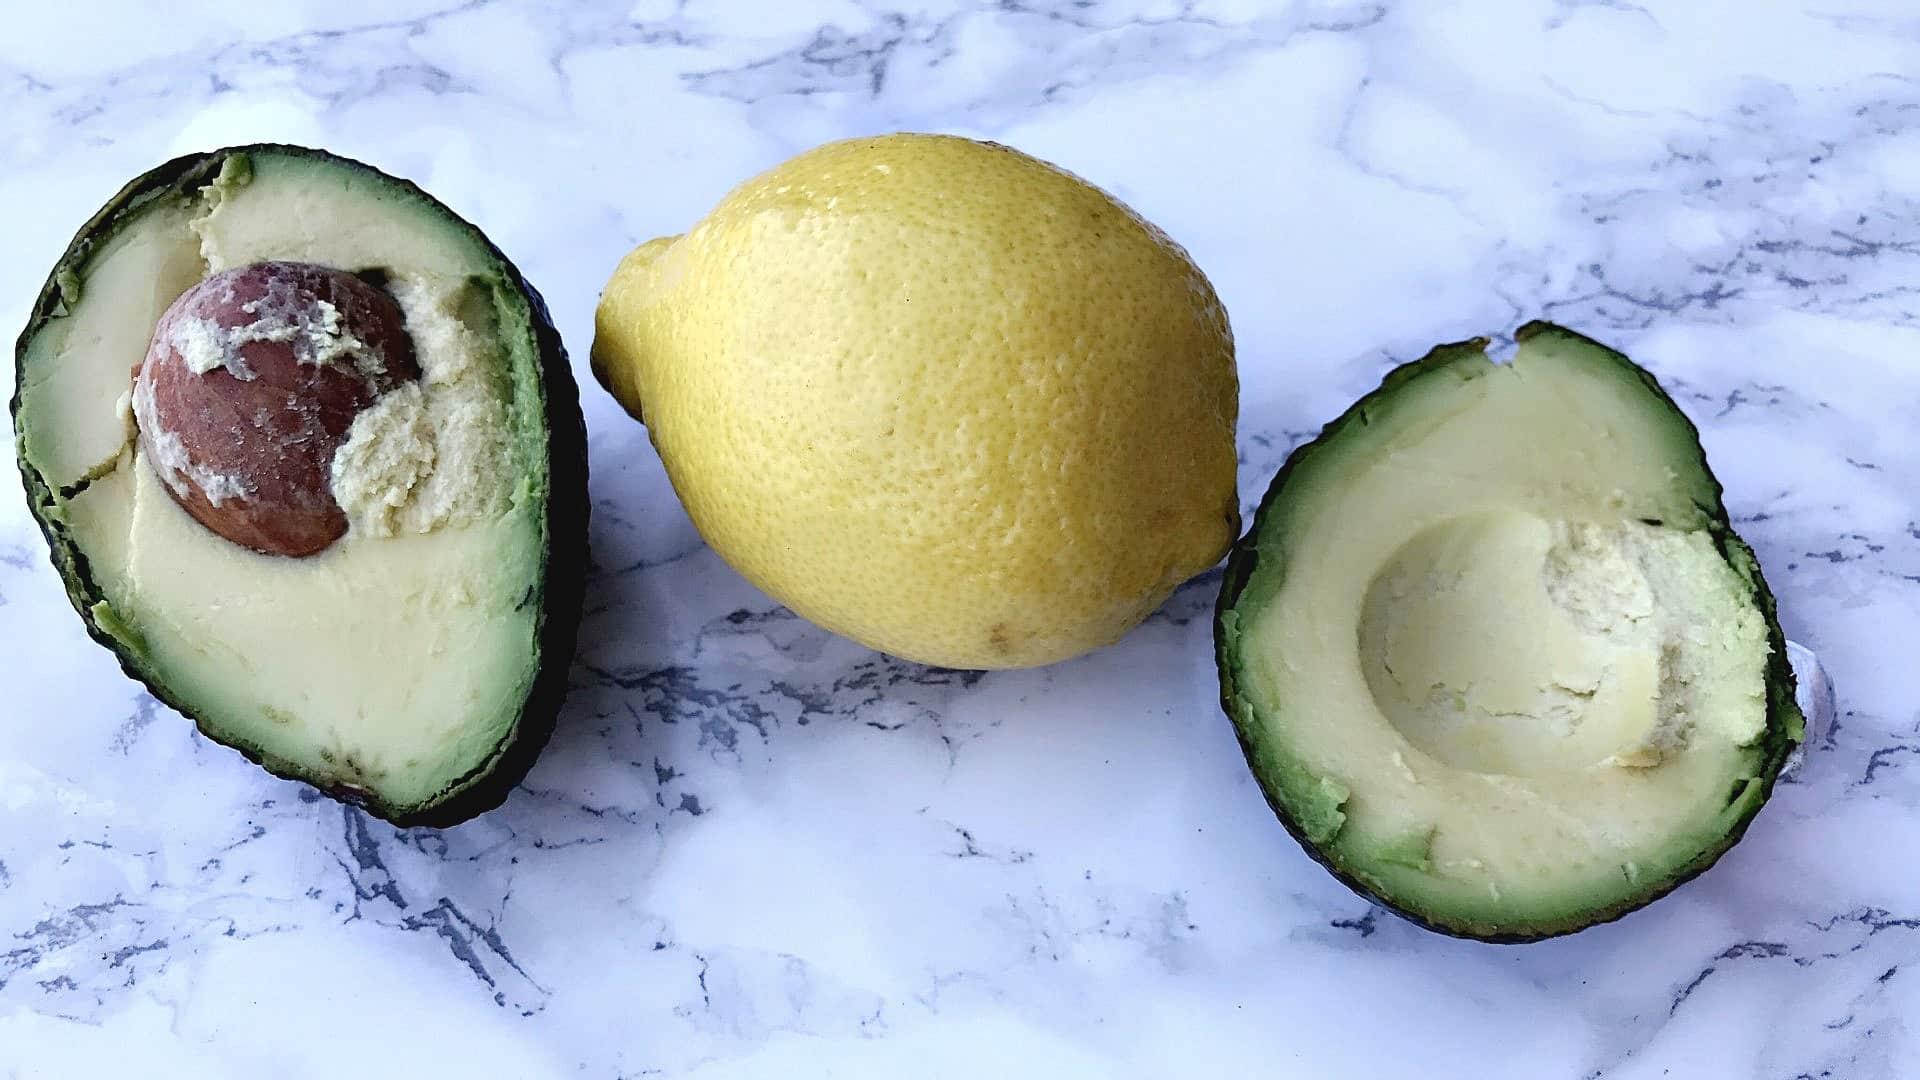 sliced avocado and a lemon on a counter top